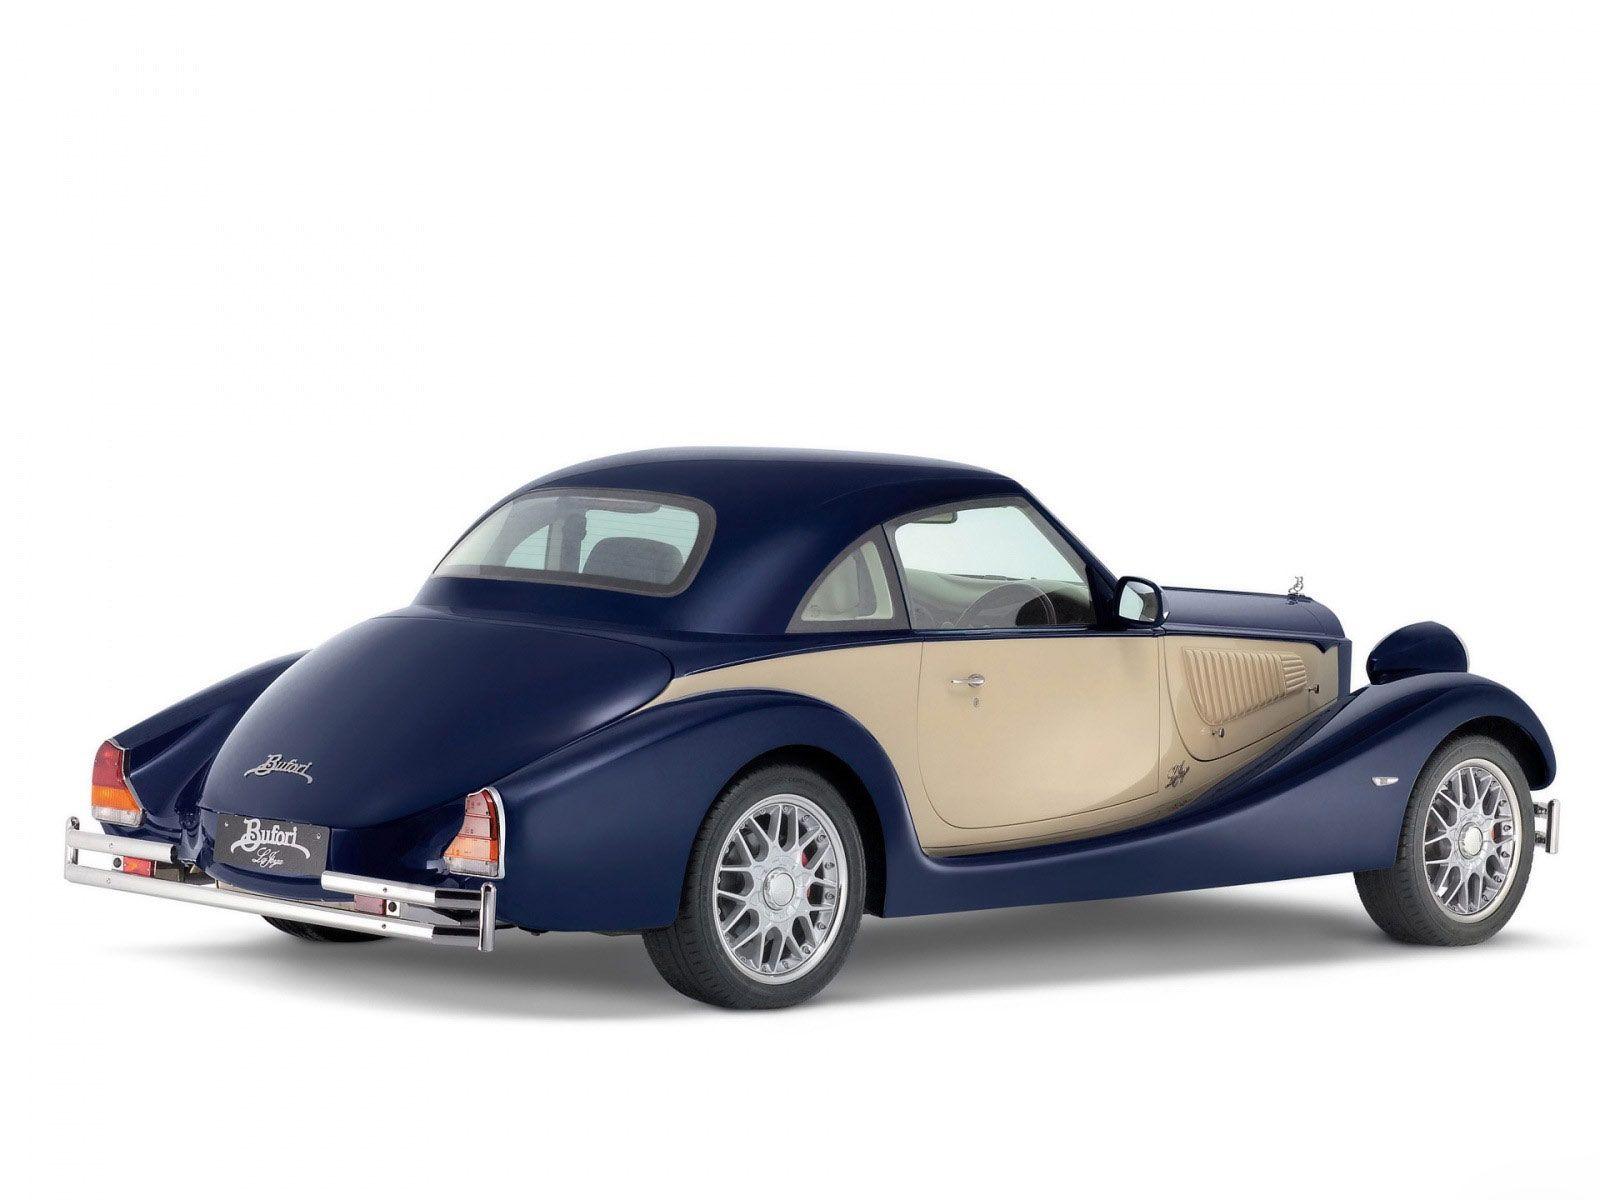 Bufori Classic Cars Retro Cars Downloads Backgrounds